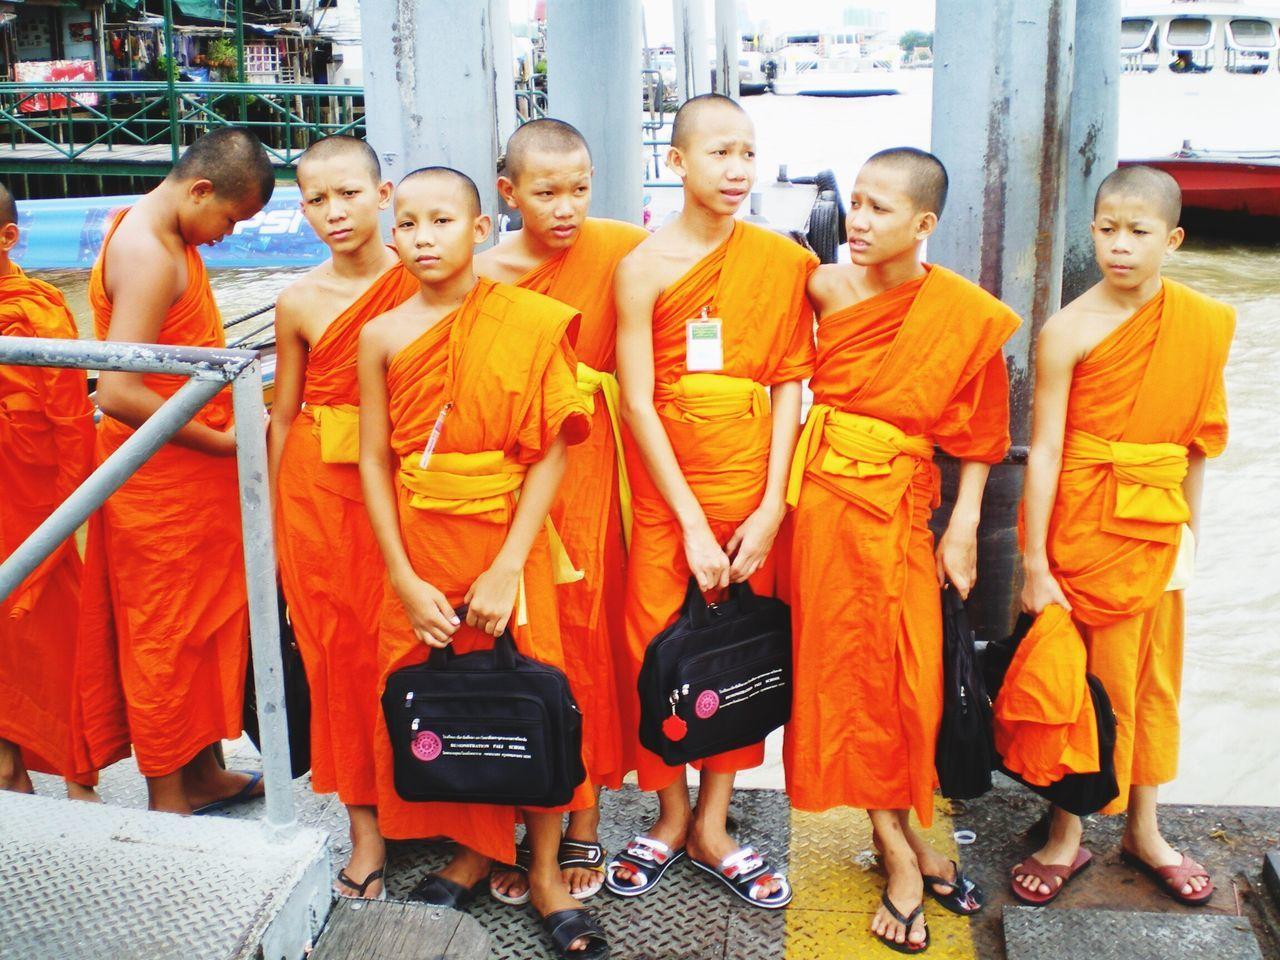 The Photojournalist - 2016 EyeEm Awards The Street Photographer - 2016 EyeEm Awards EyeEm Gallery Thailand Monks Student Life Students The Week Of Eyeem The Week On Eyem Urban My Commute The Following 43 Golden Moments EyeEm X Mashable - My Commute